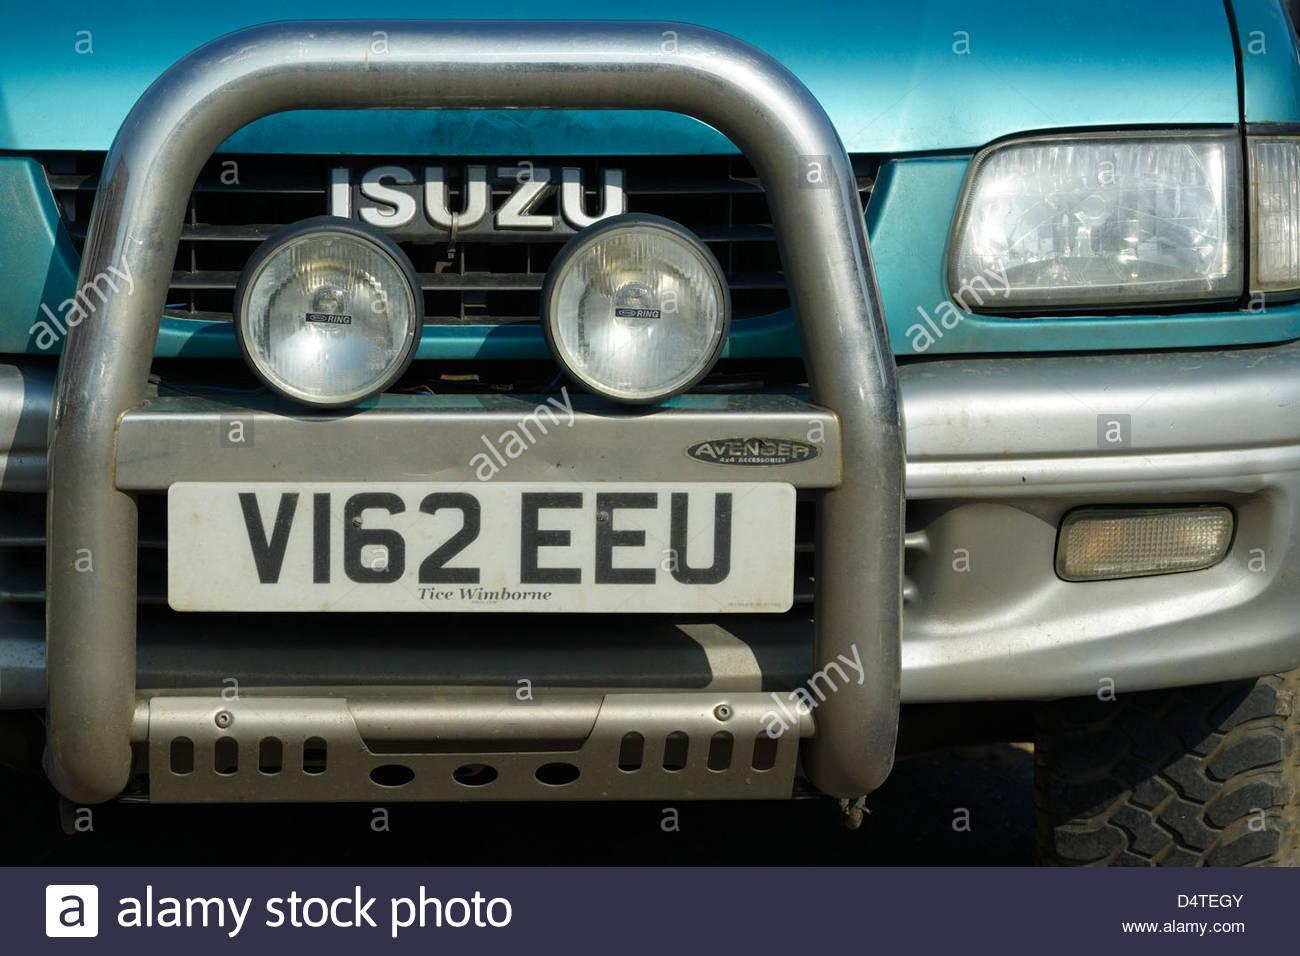 hight resolution of isuzu 4x4 front with bull bars blandford forum dorset england uk stock image